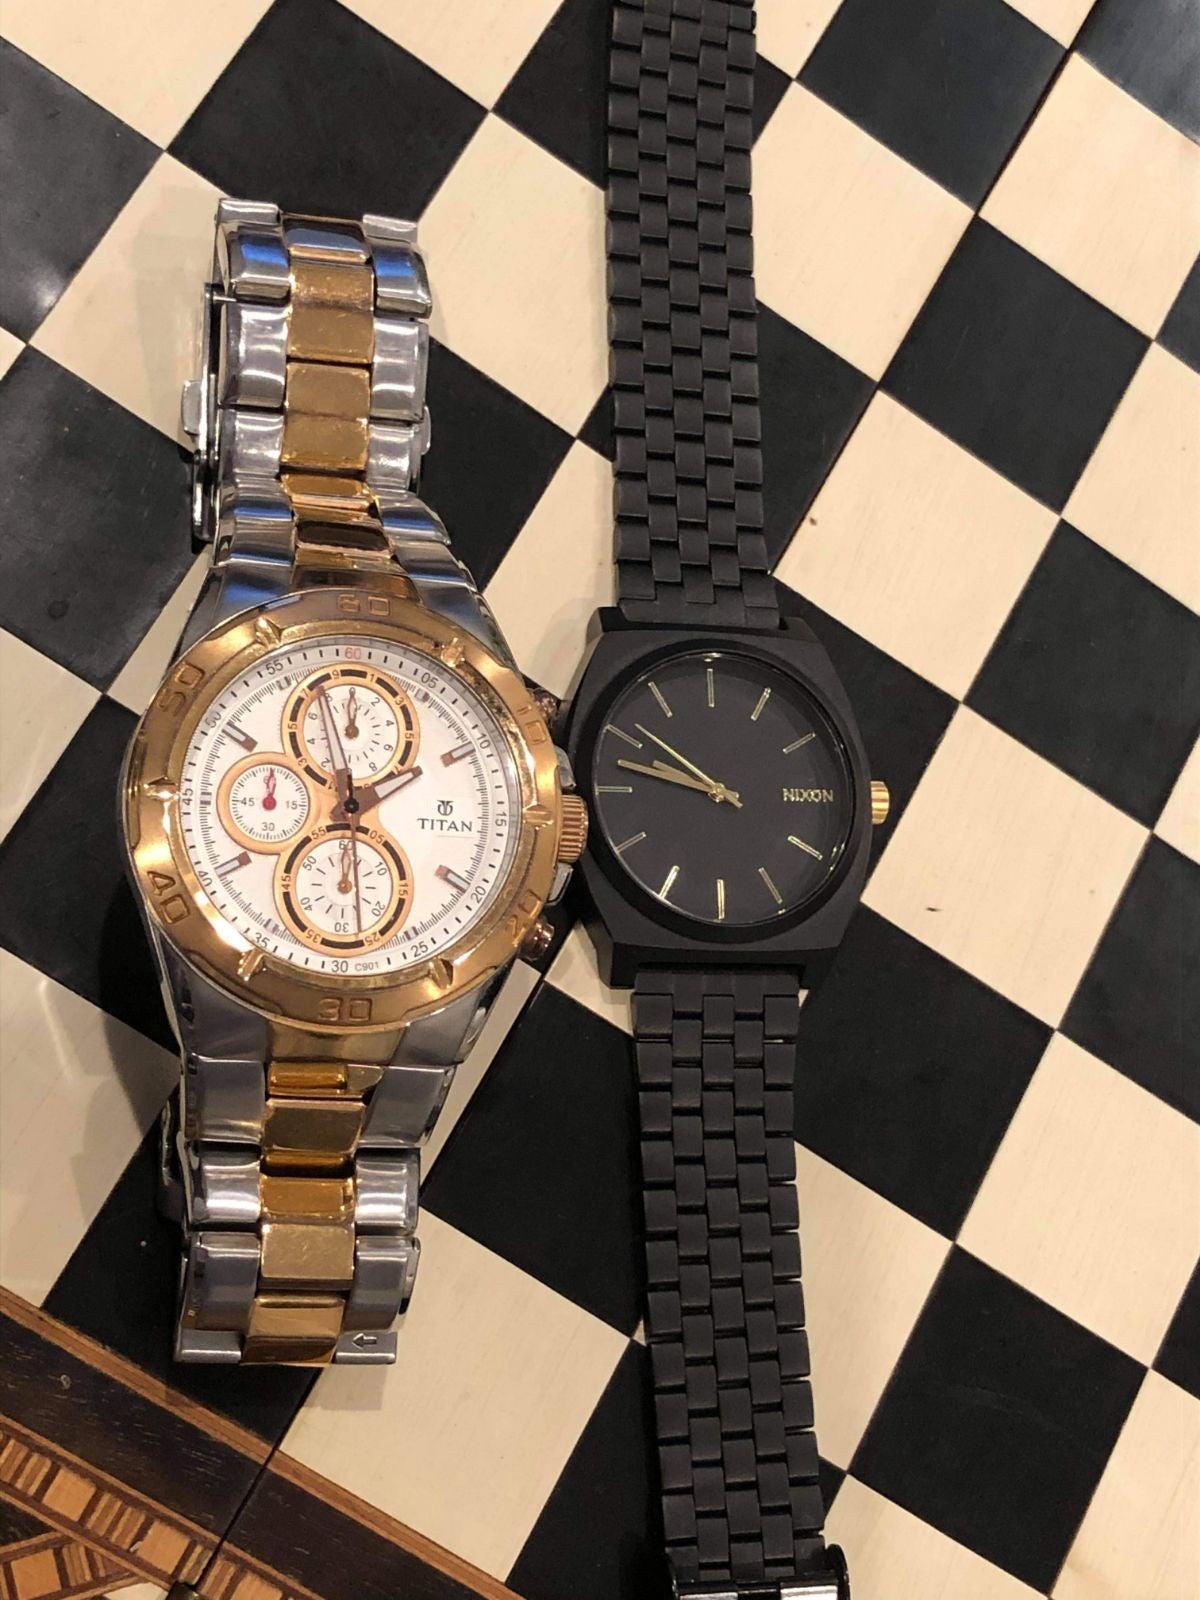 Classy Titan and Nixon Watch